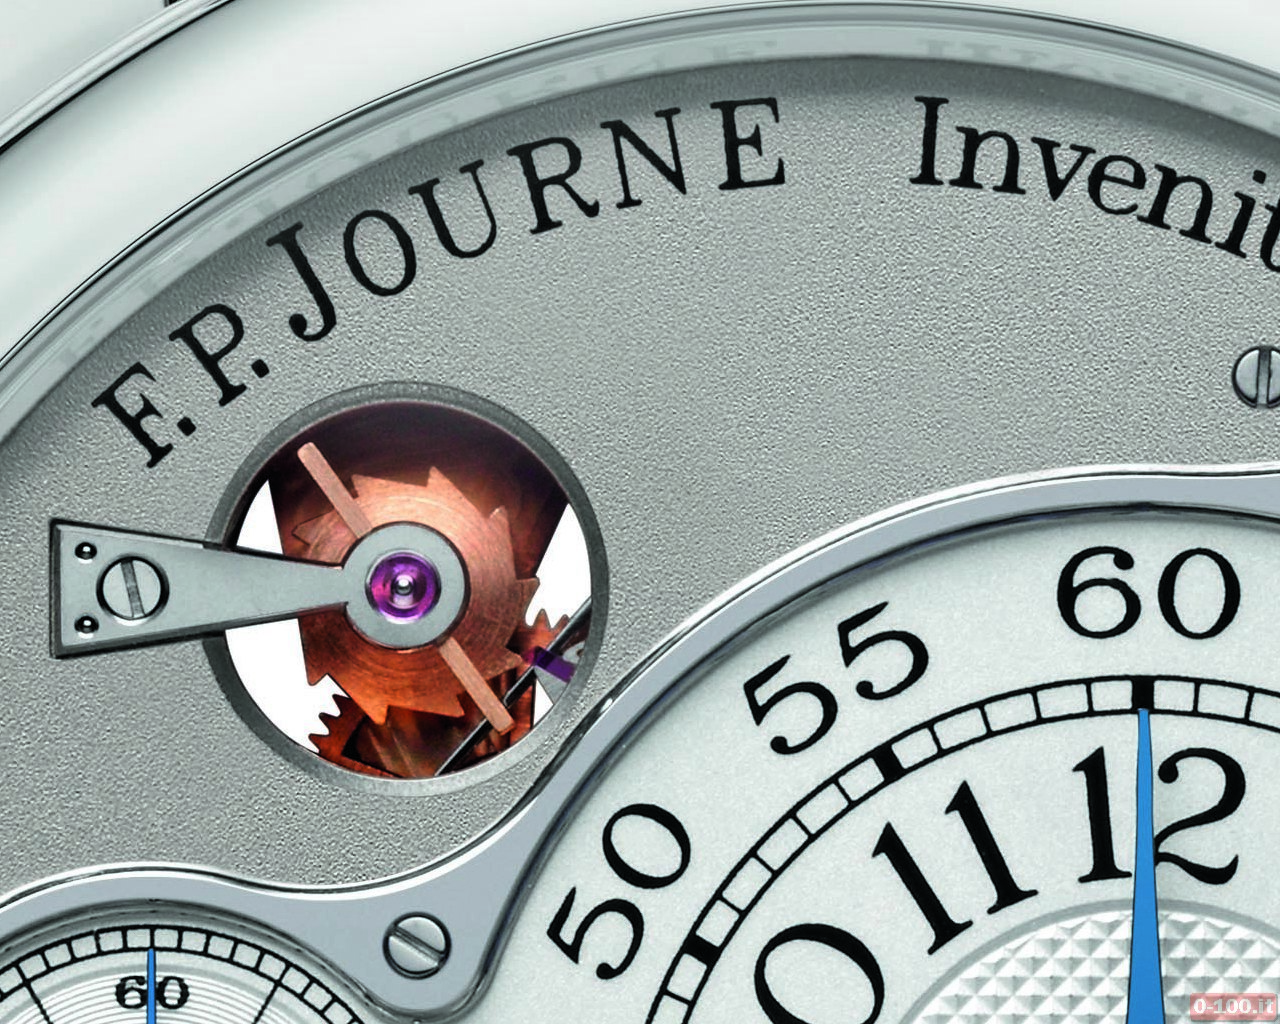 f-p-journe-chronometre-optimum-0-100_11